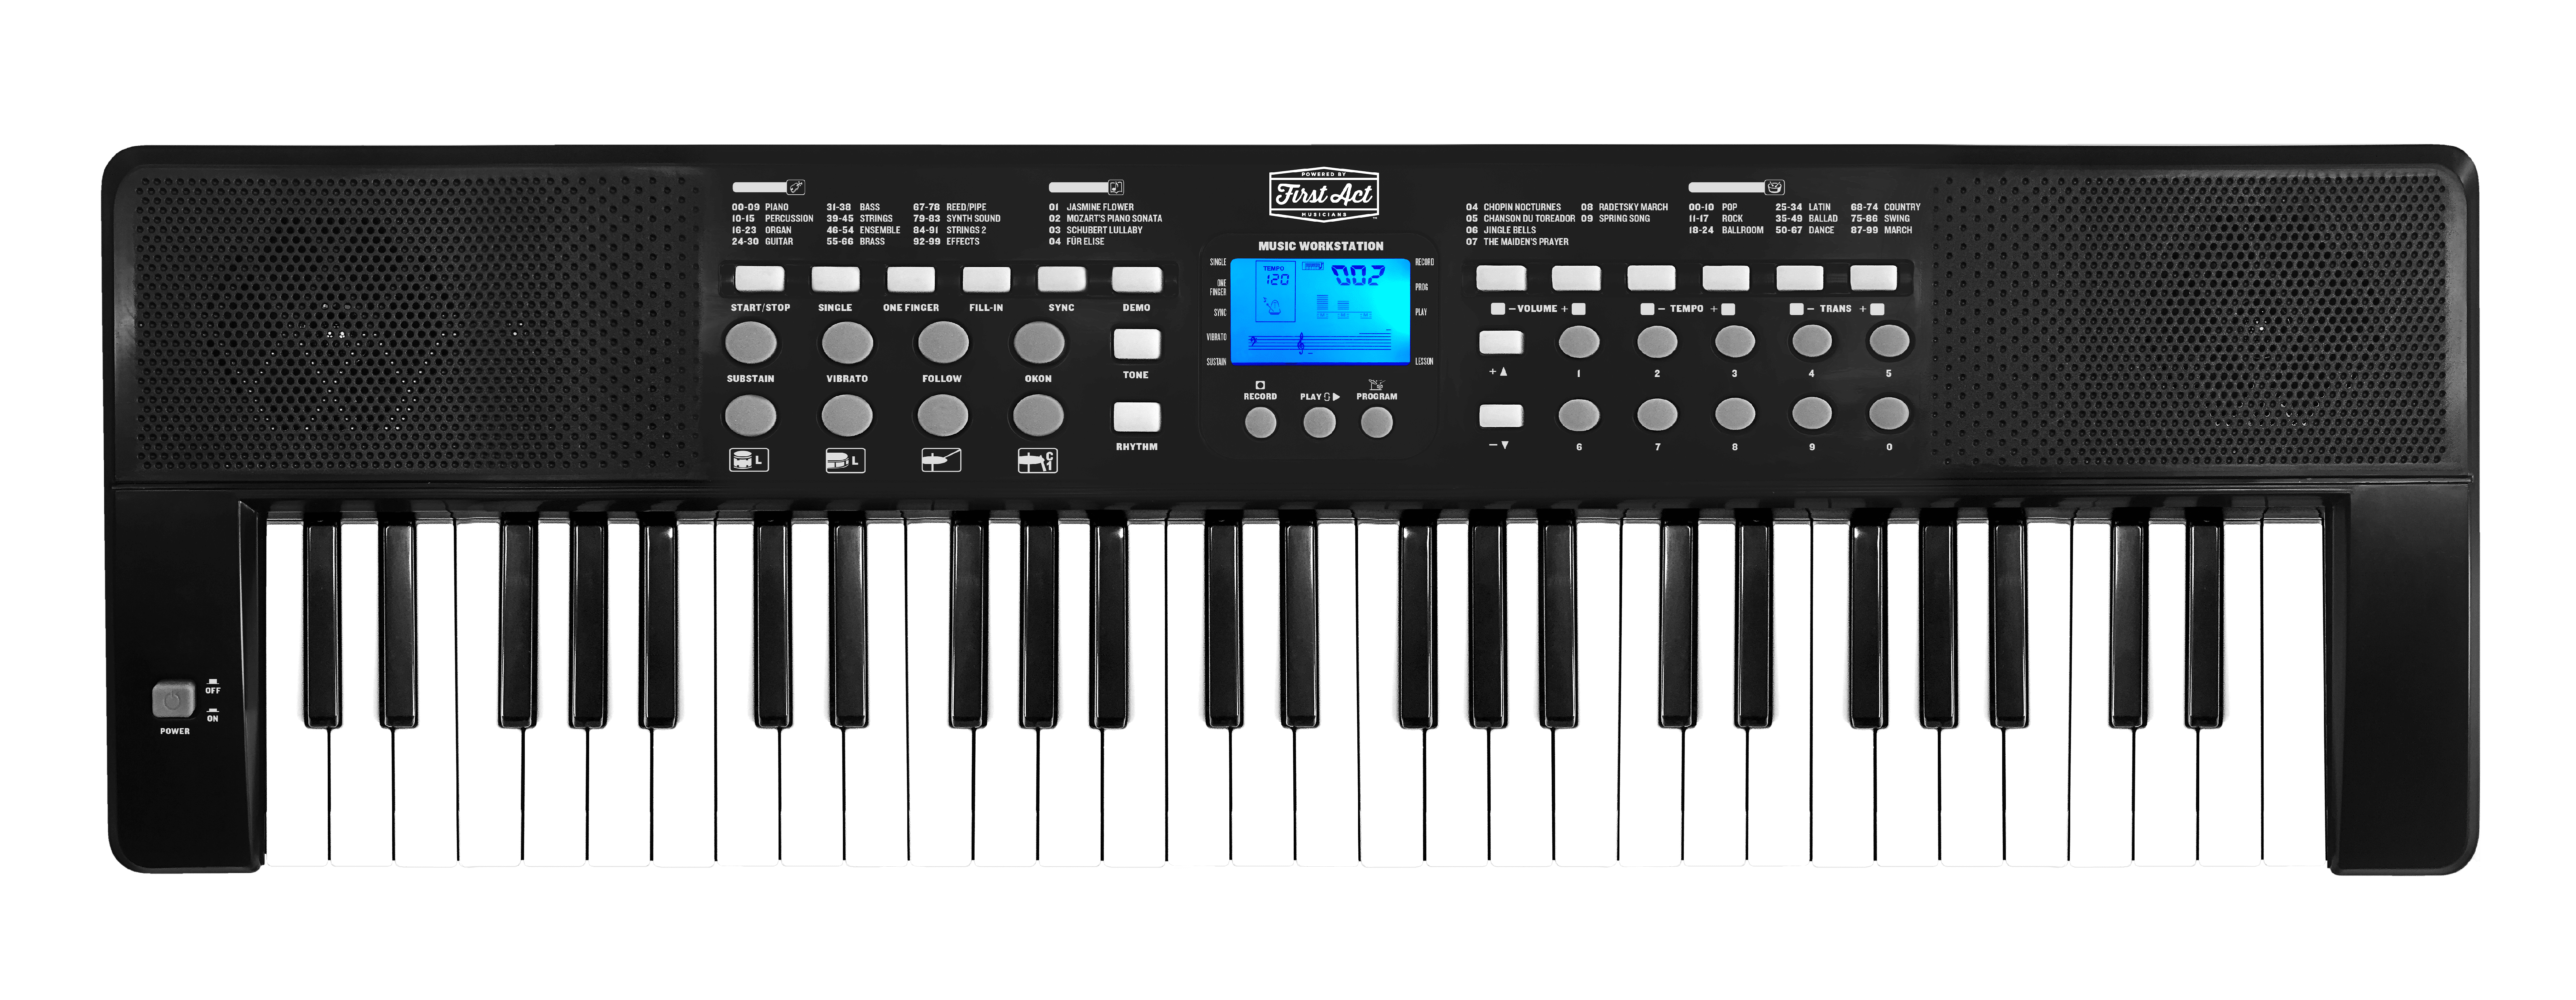 First Act 54 Key Digital Keyboard by Jazwares, LLC.